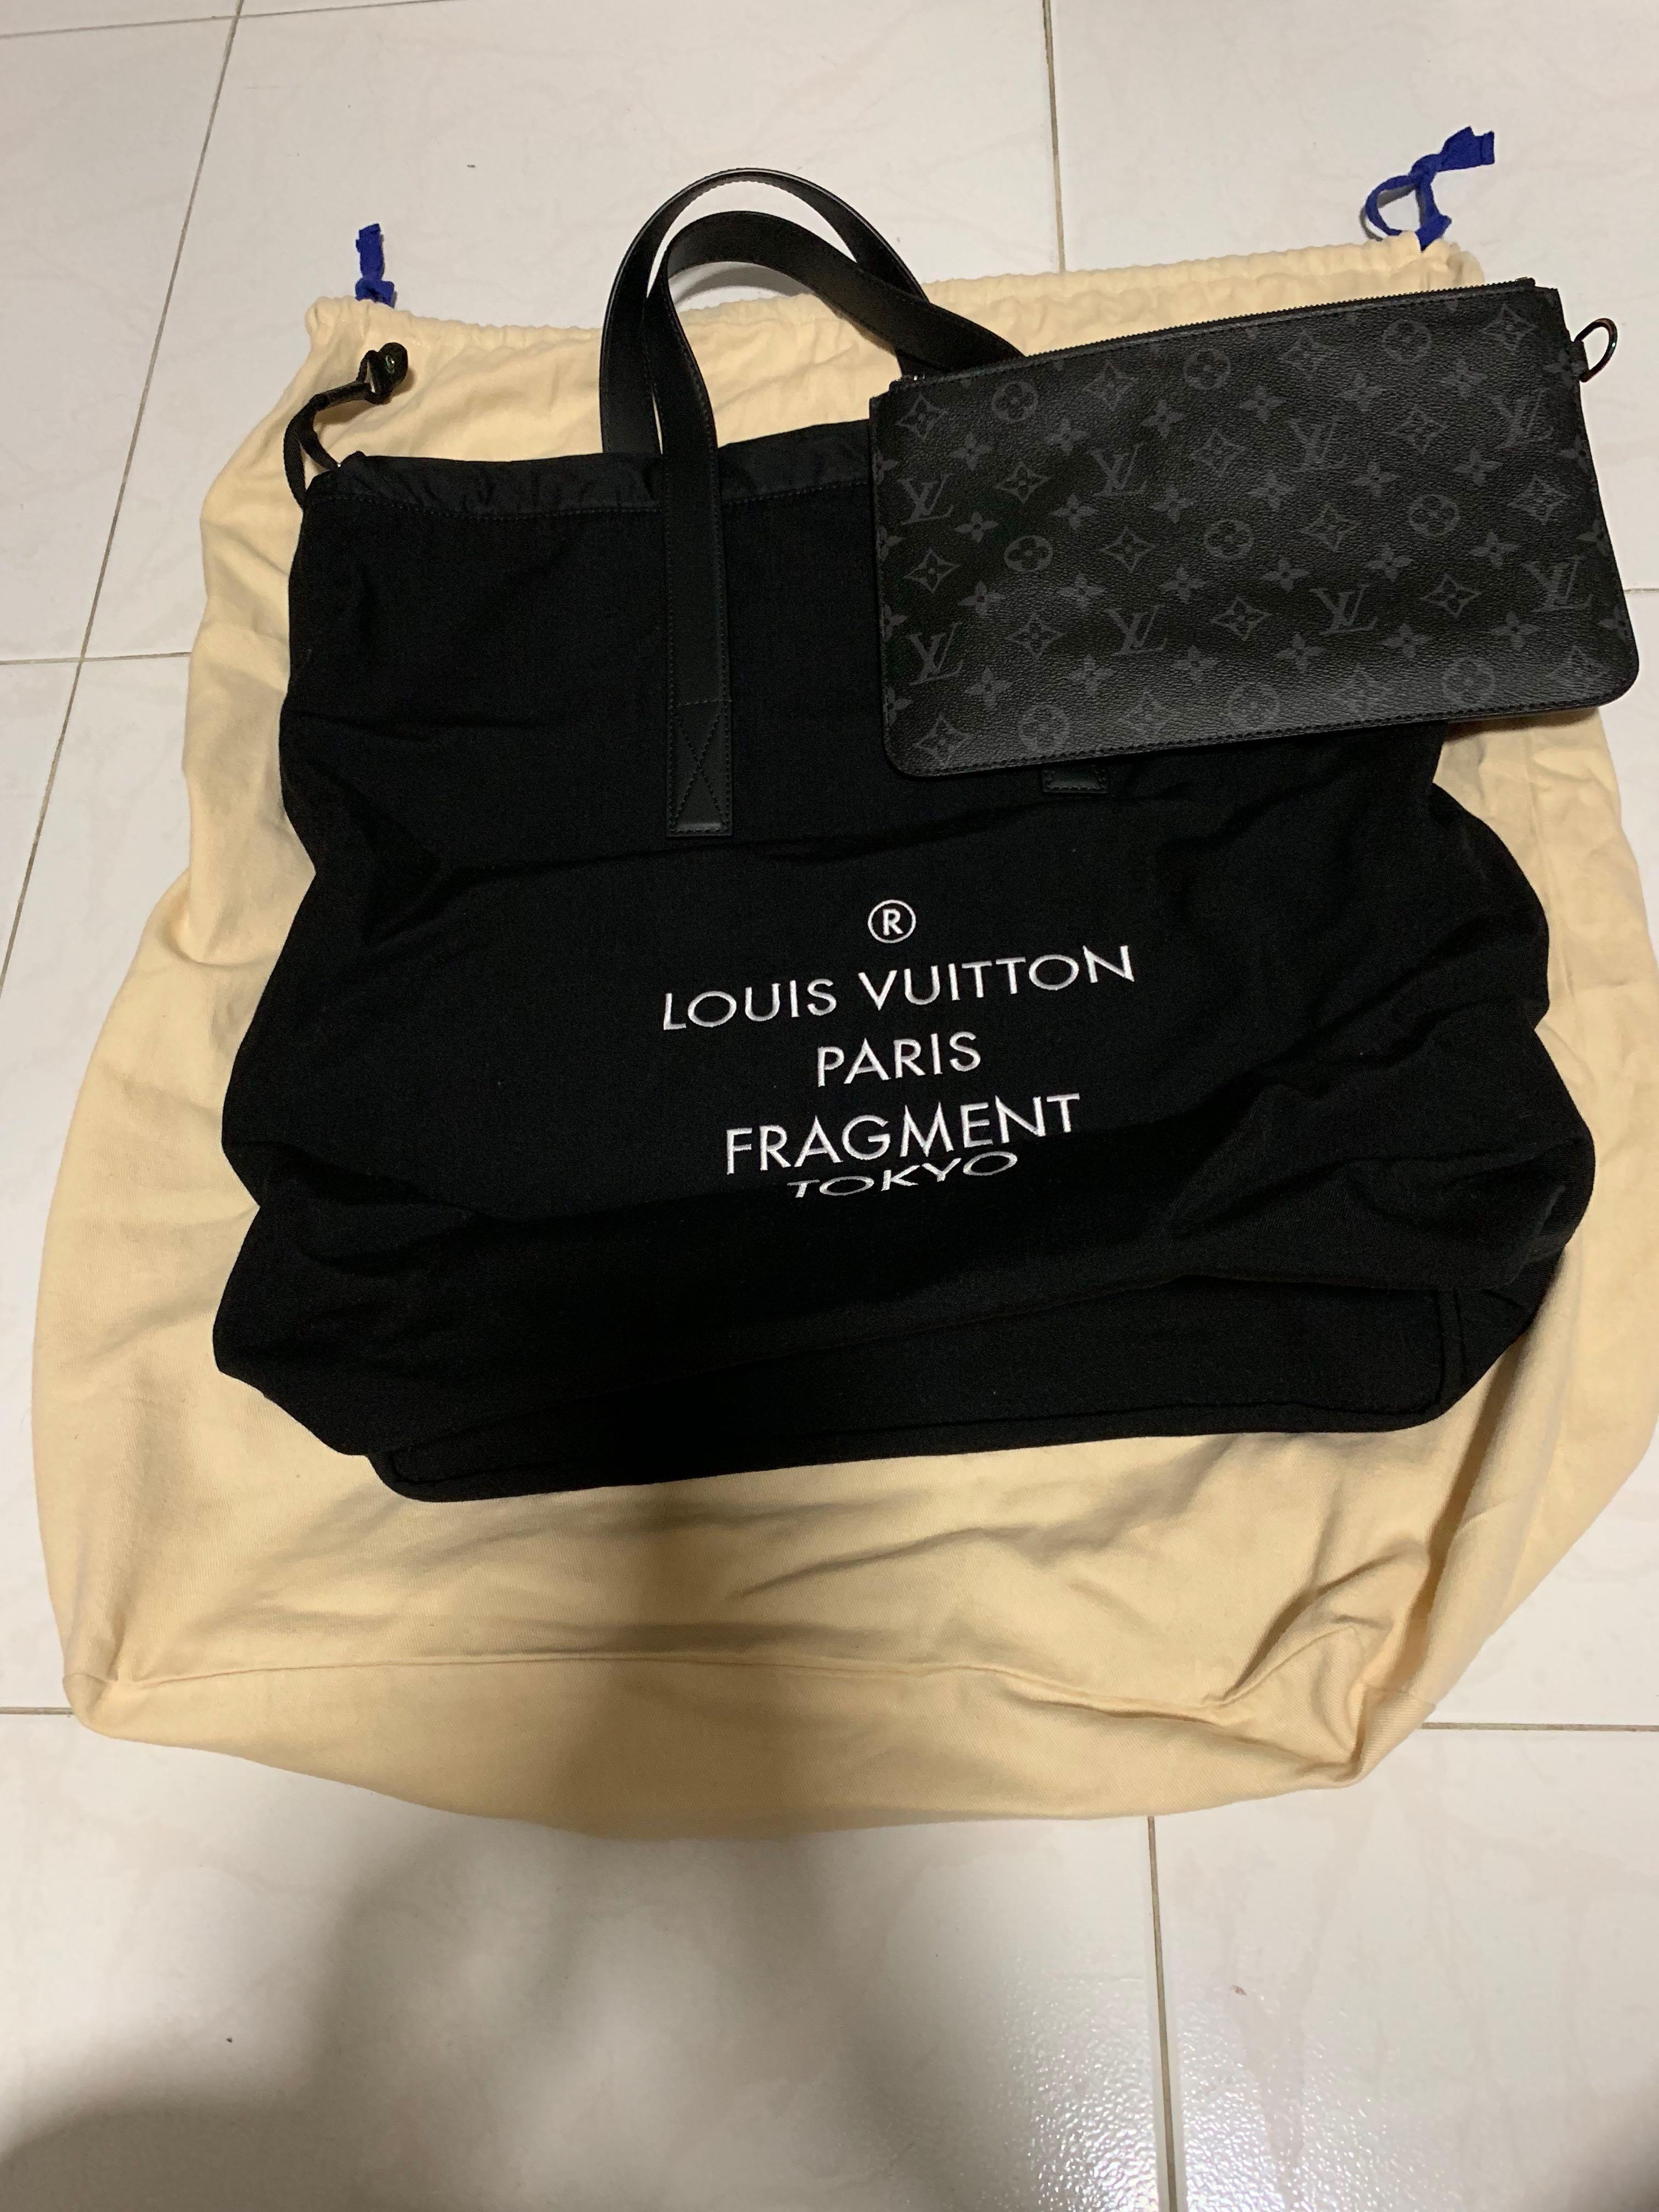 6d6fa60bdfa Louis Vuitton X Fragment